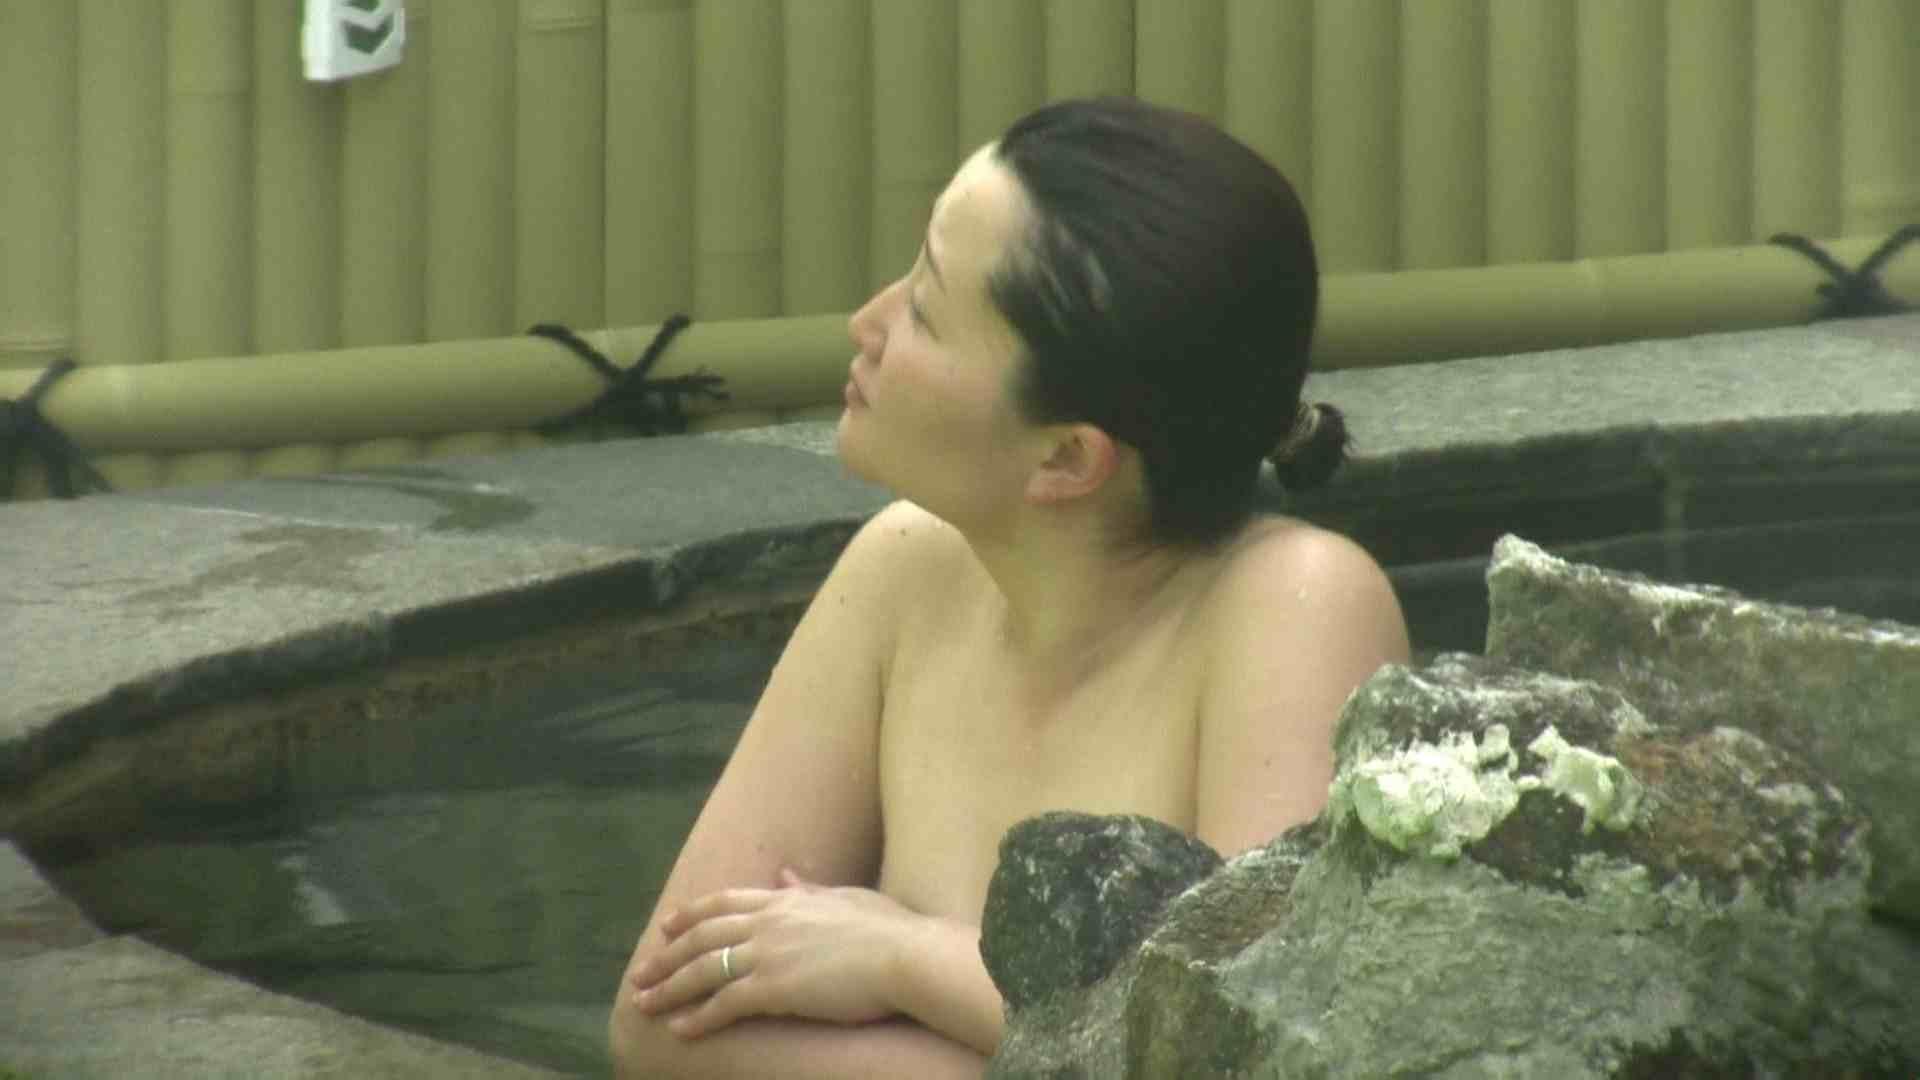 Aquaな露天風呂Vol.632 盗撮 | OLセックス  70画像 58